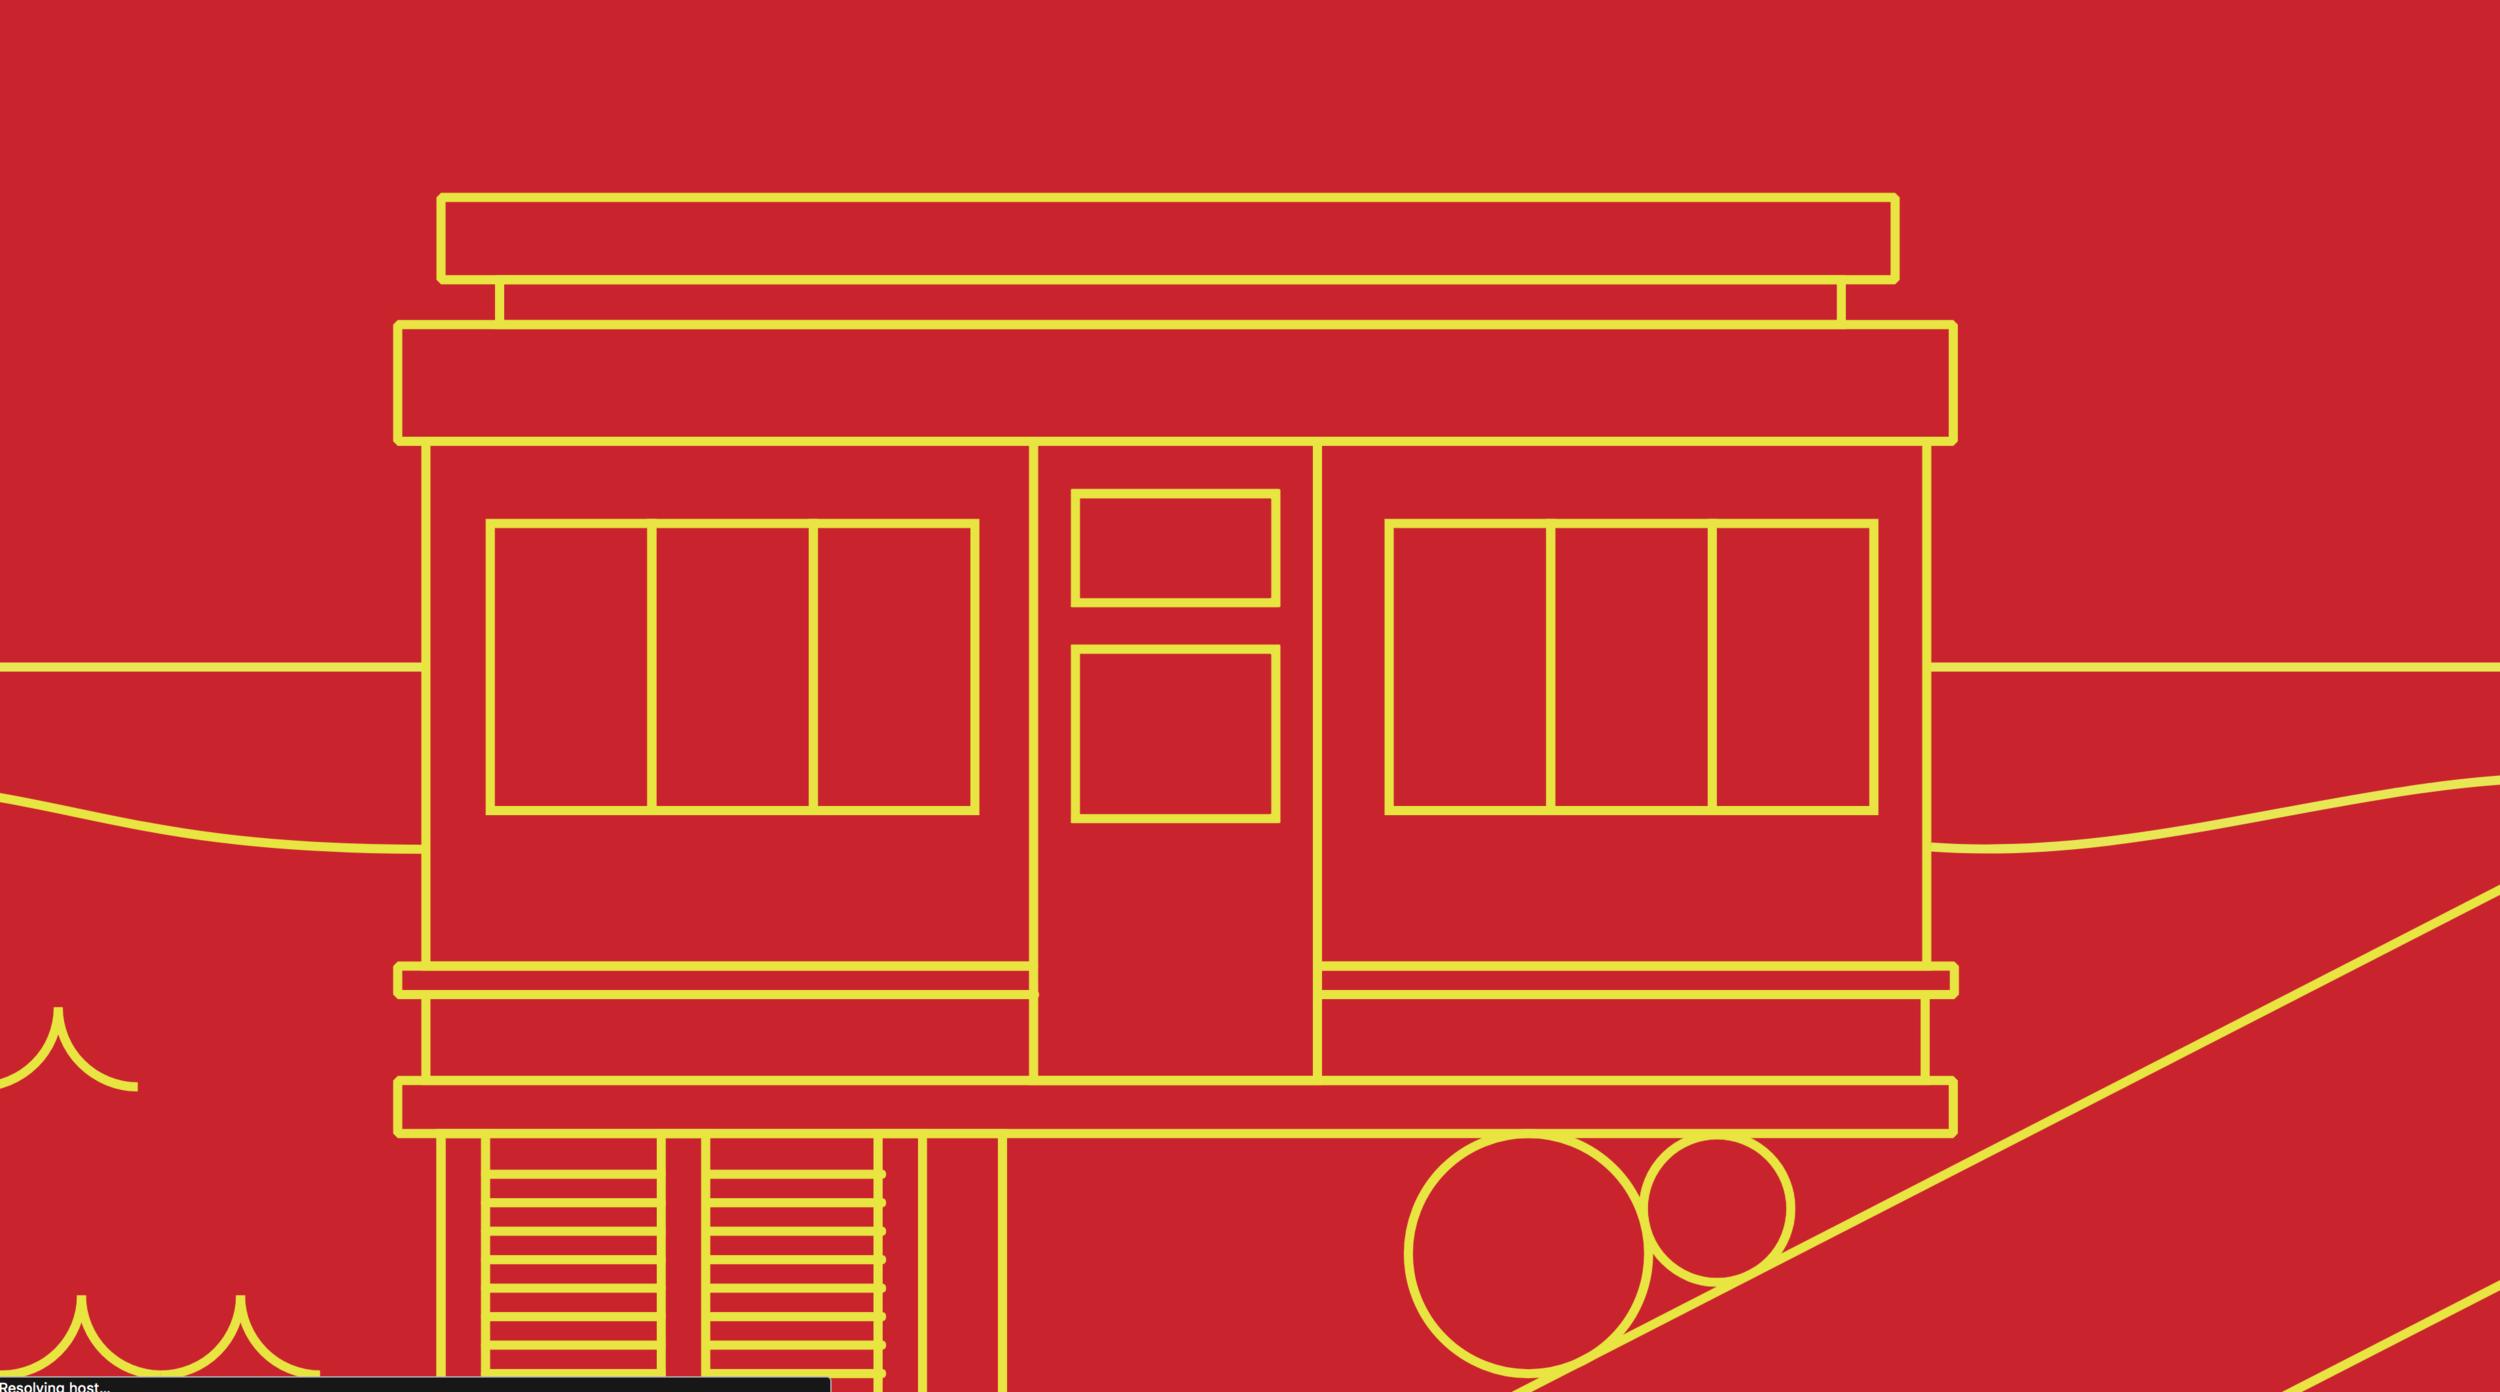 7 RailsConf 2018 Talks You Should Watch Now